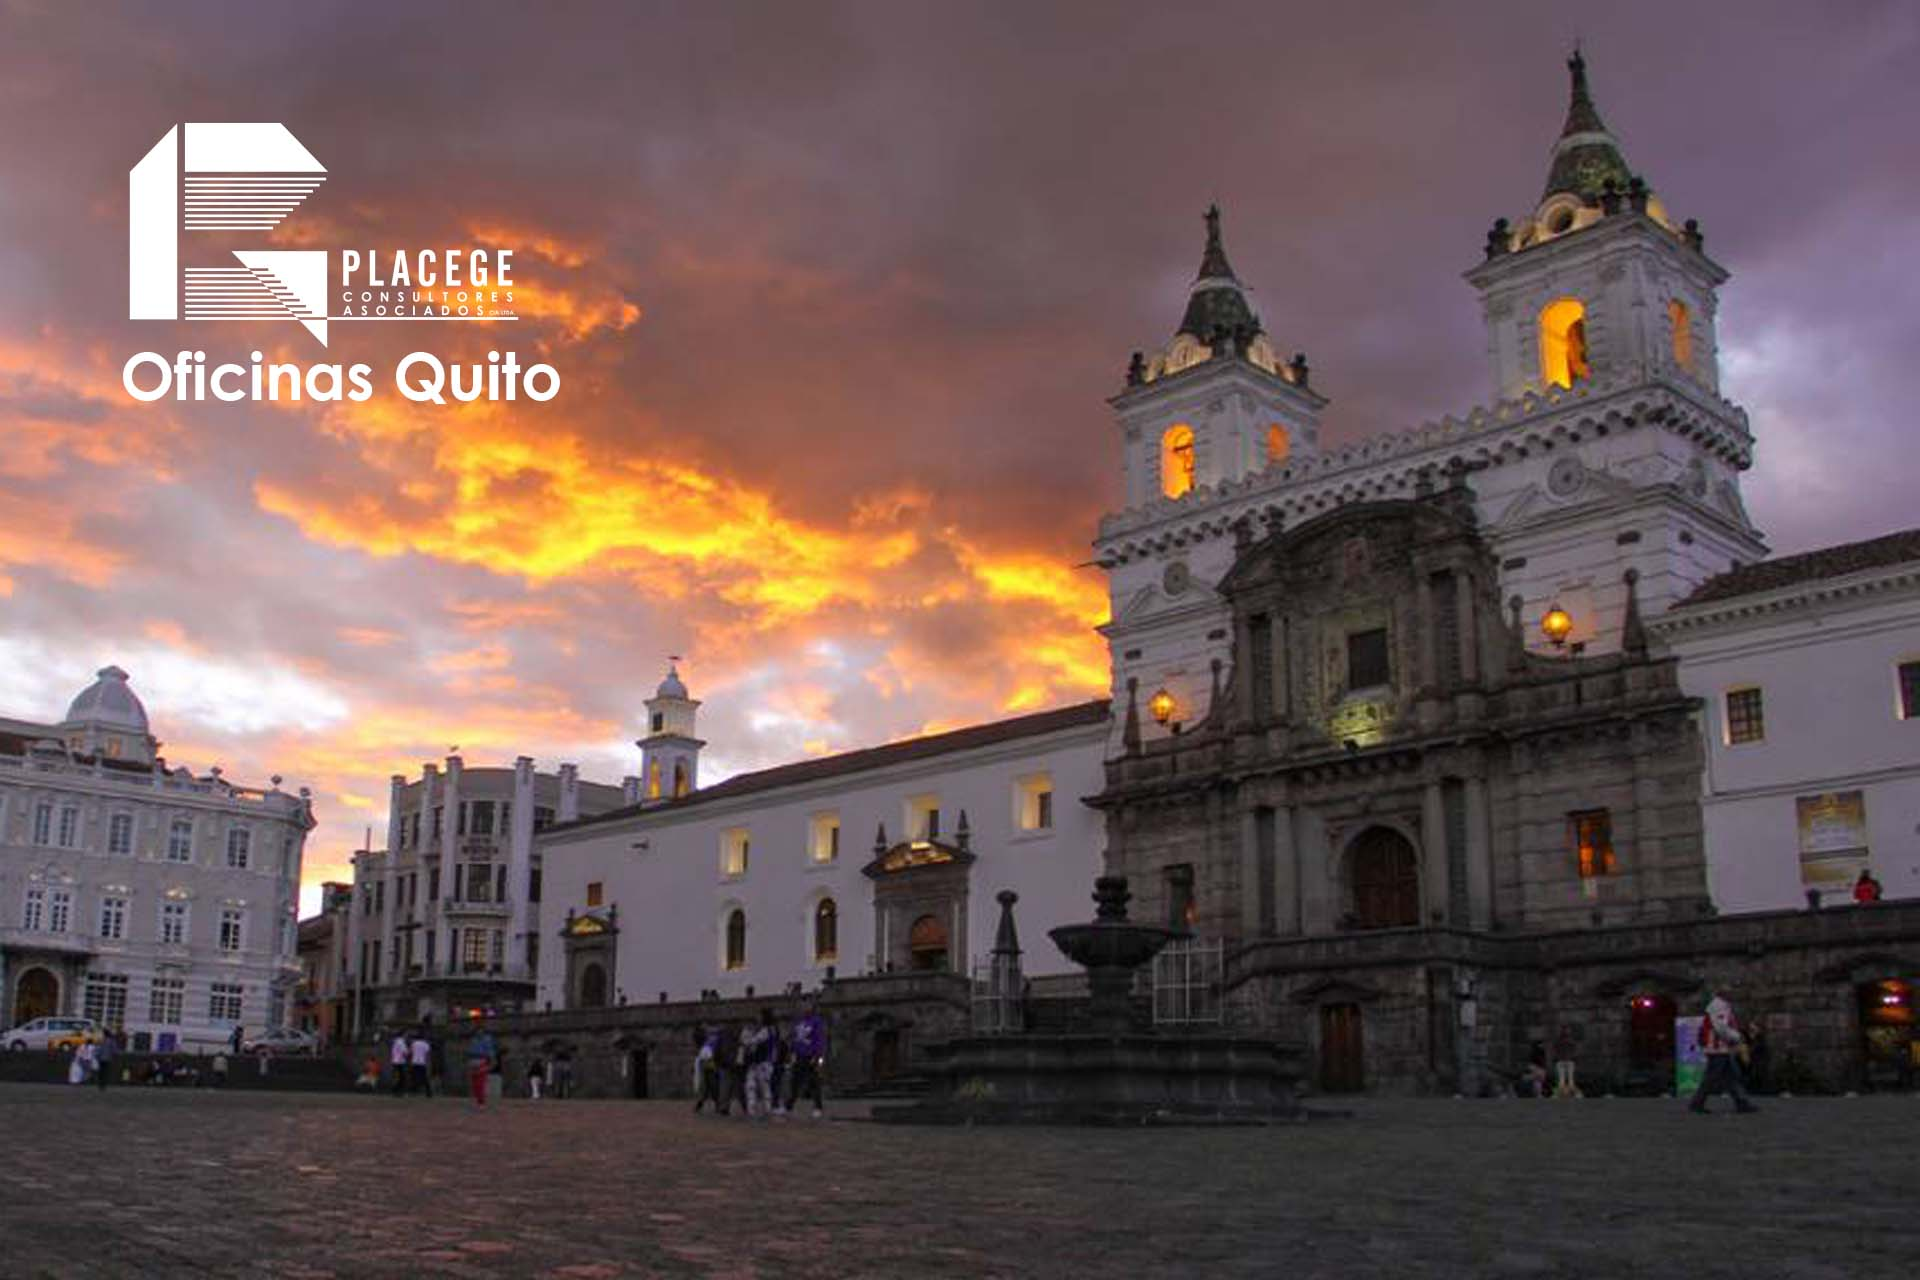 Quito - Placege Cia. ltda.